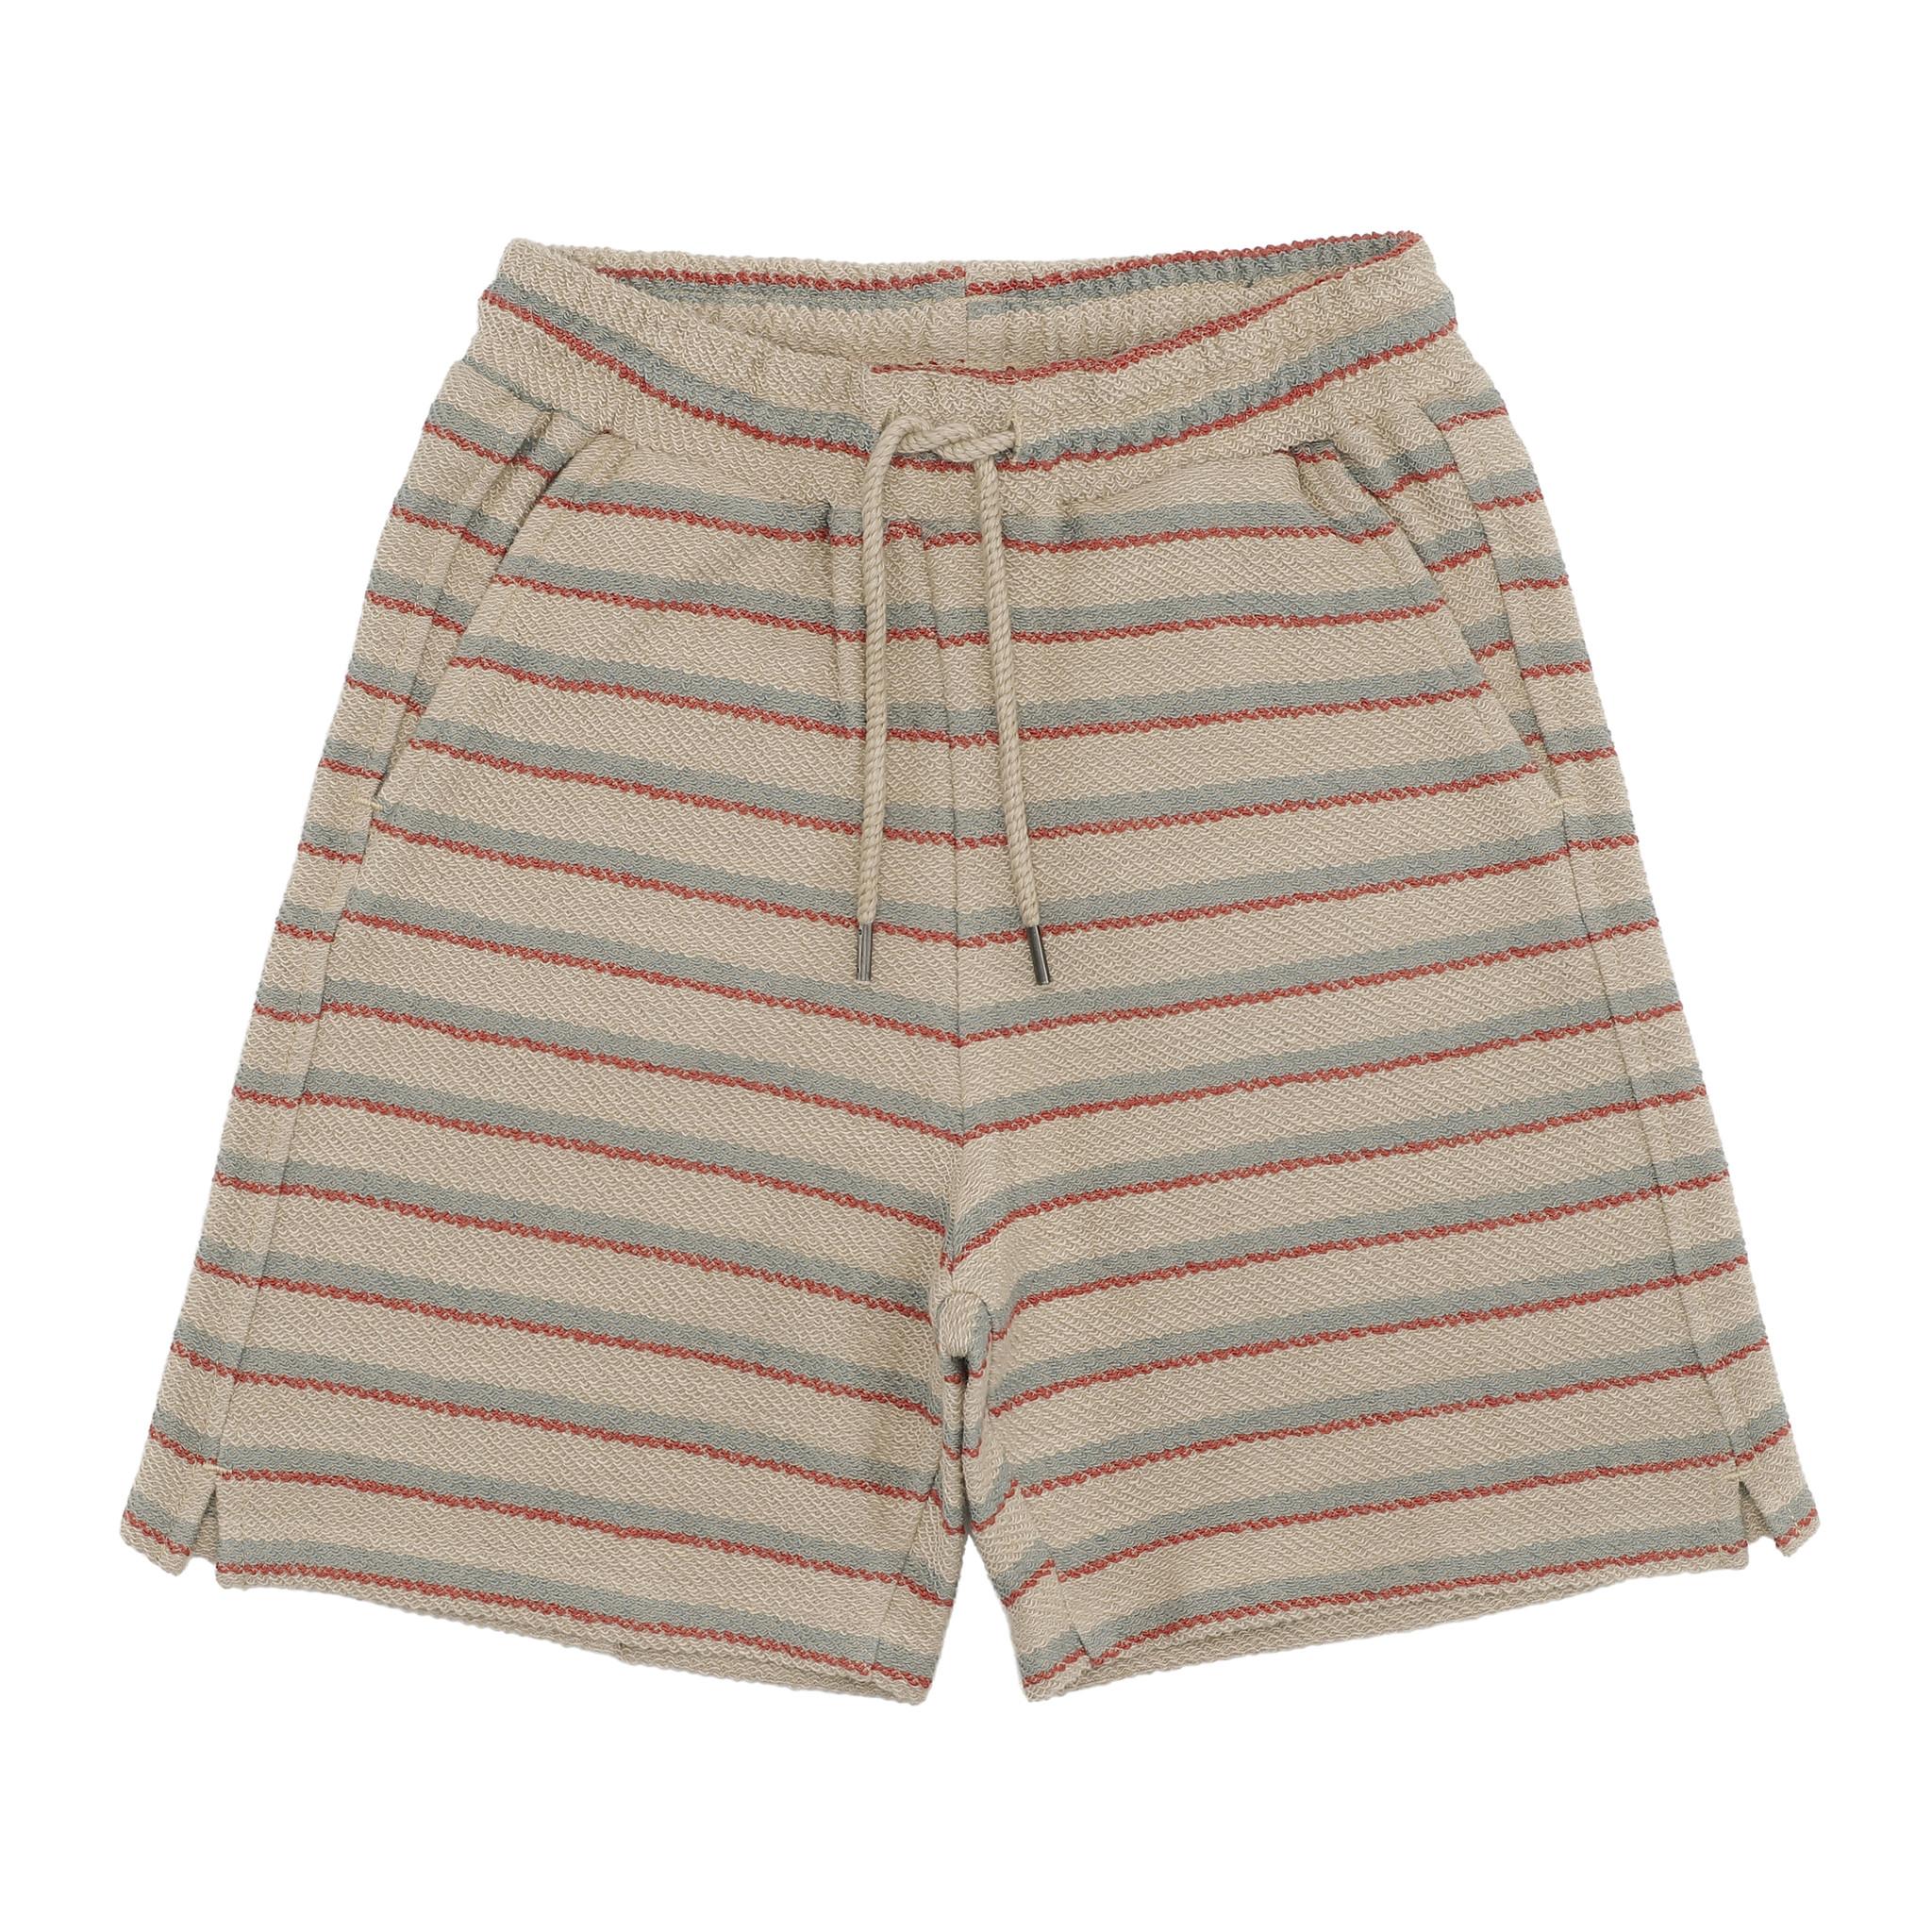 Alisdair shorts - Mojave Desert / AOP wavy-1